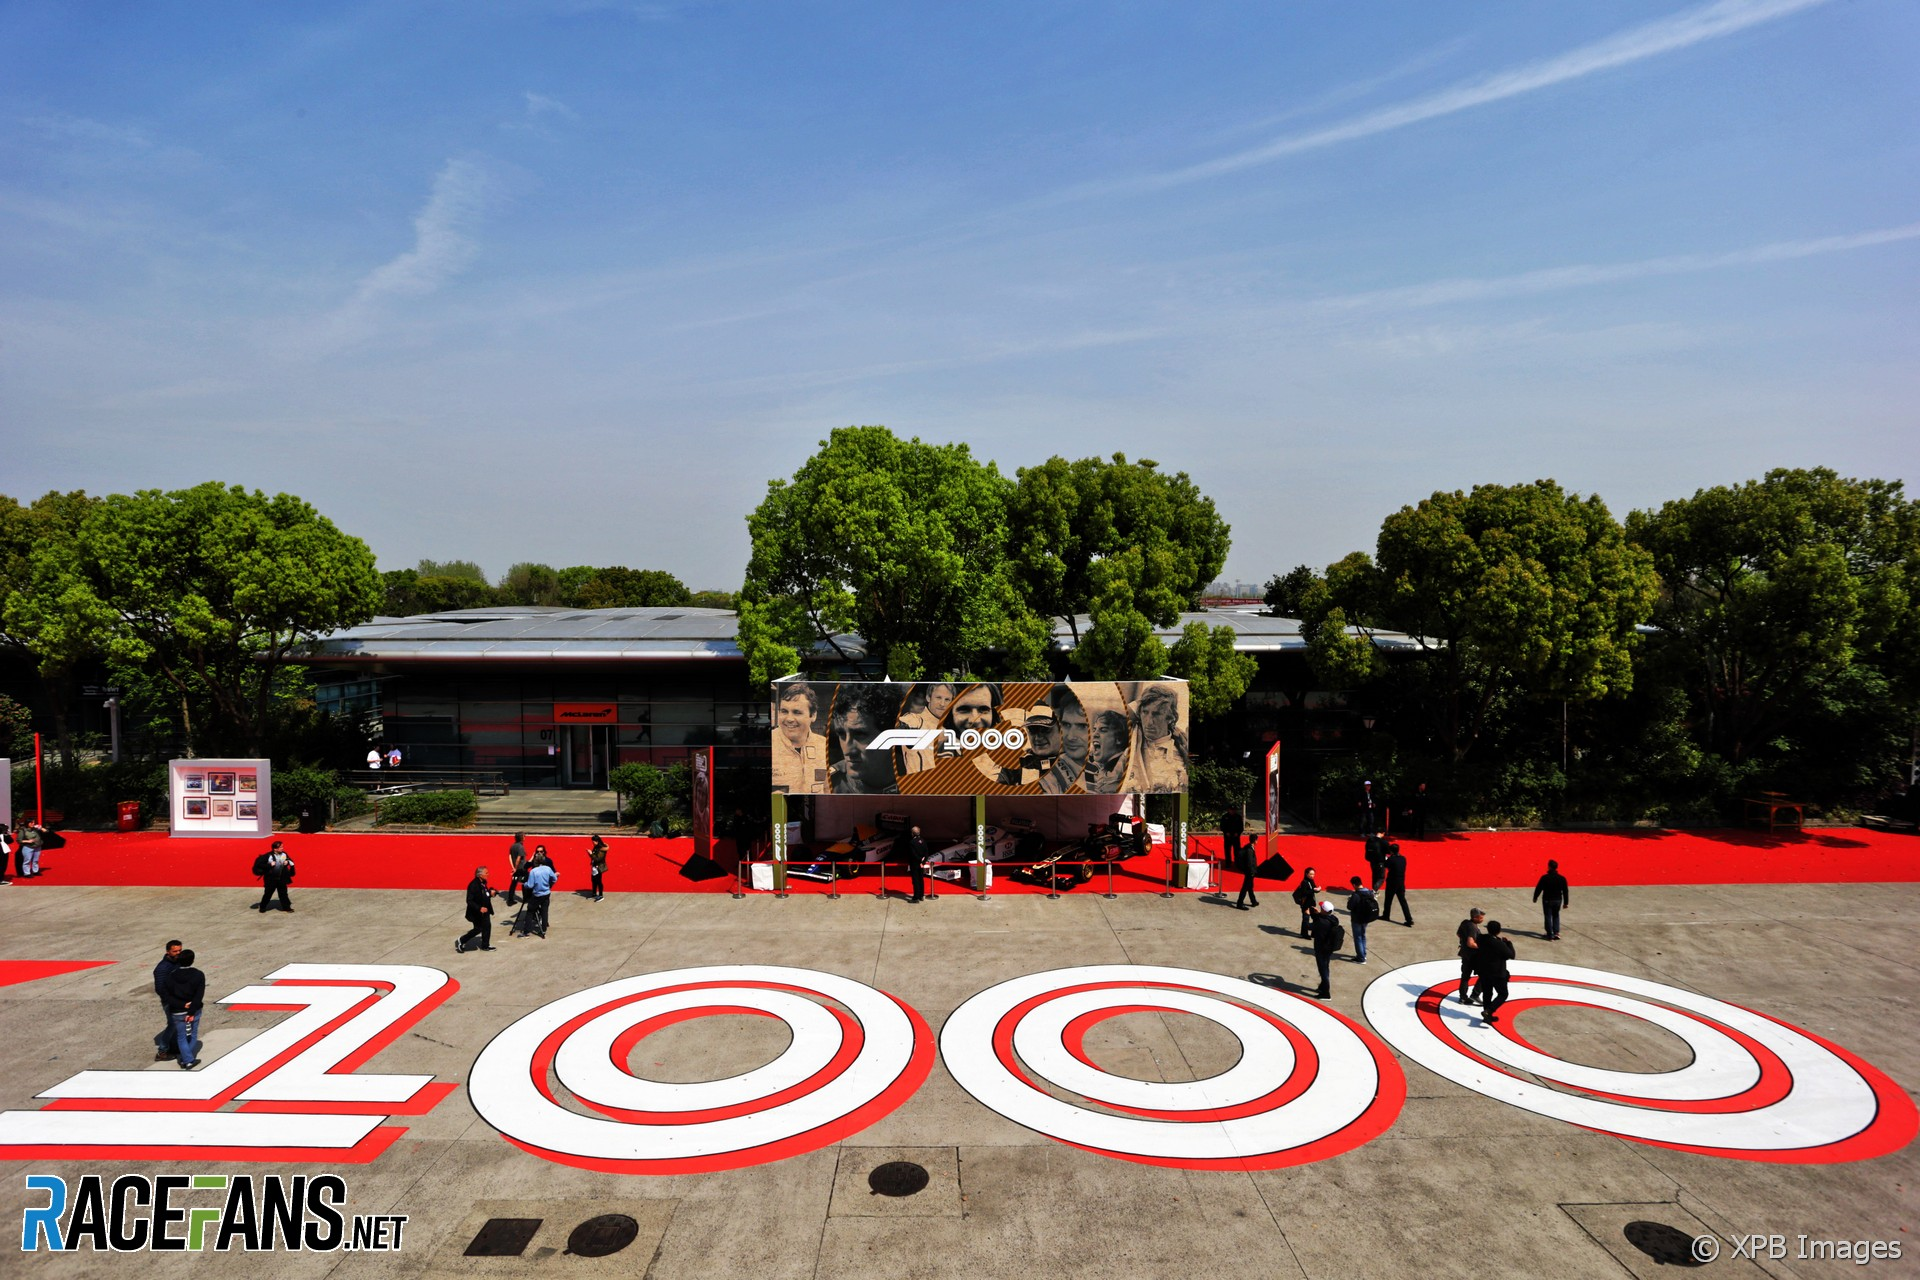 1,000th race signage, Shanghai International Circuit, 2019